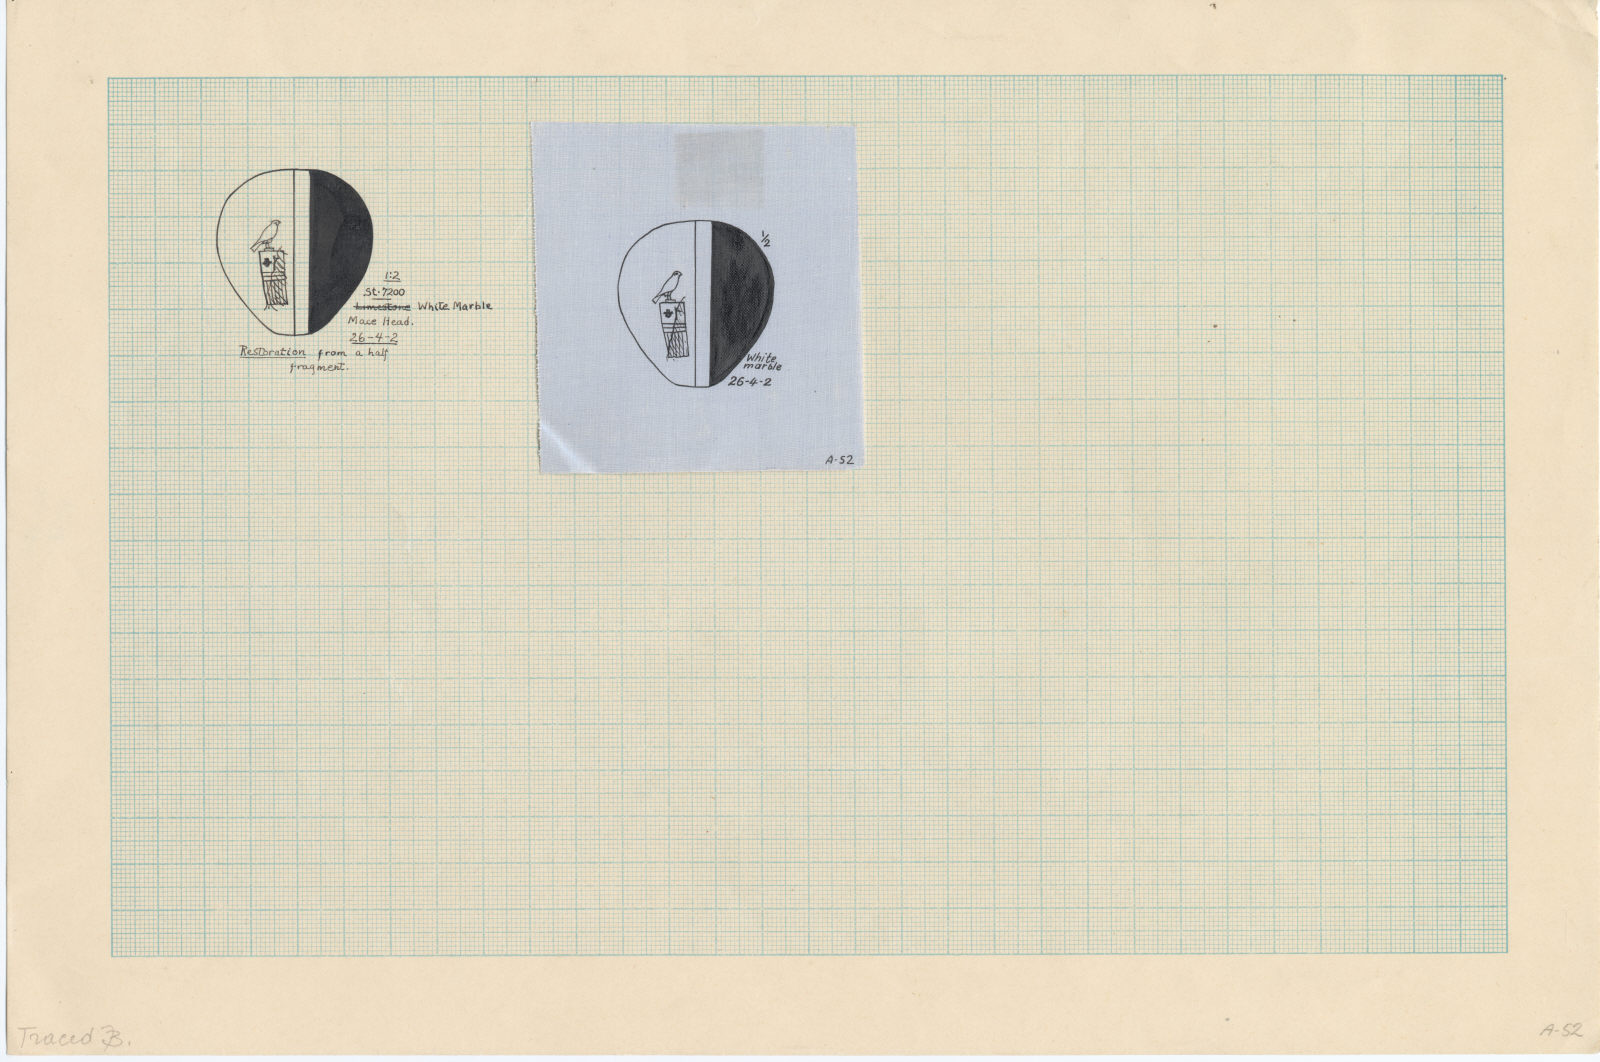 Drawings: Street G 7200: mace head, inscribed